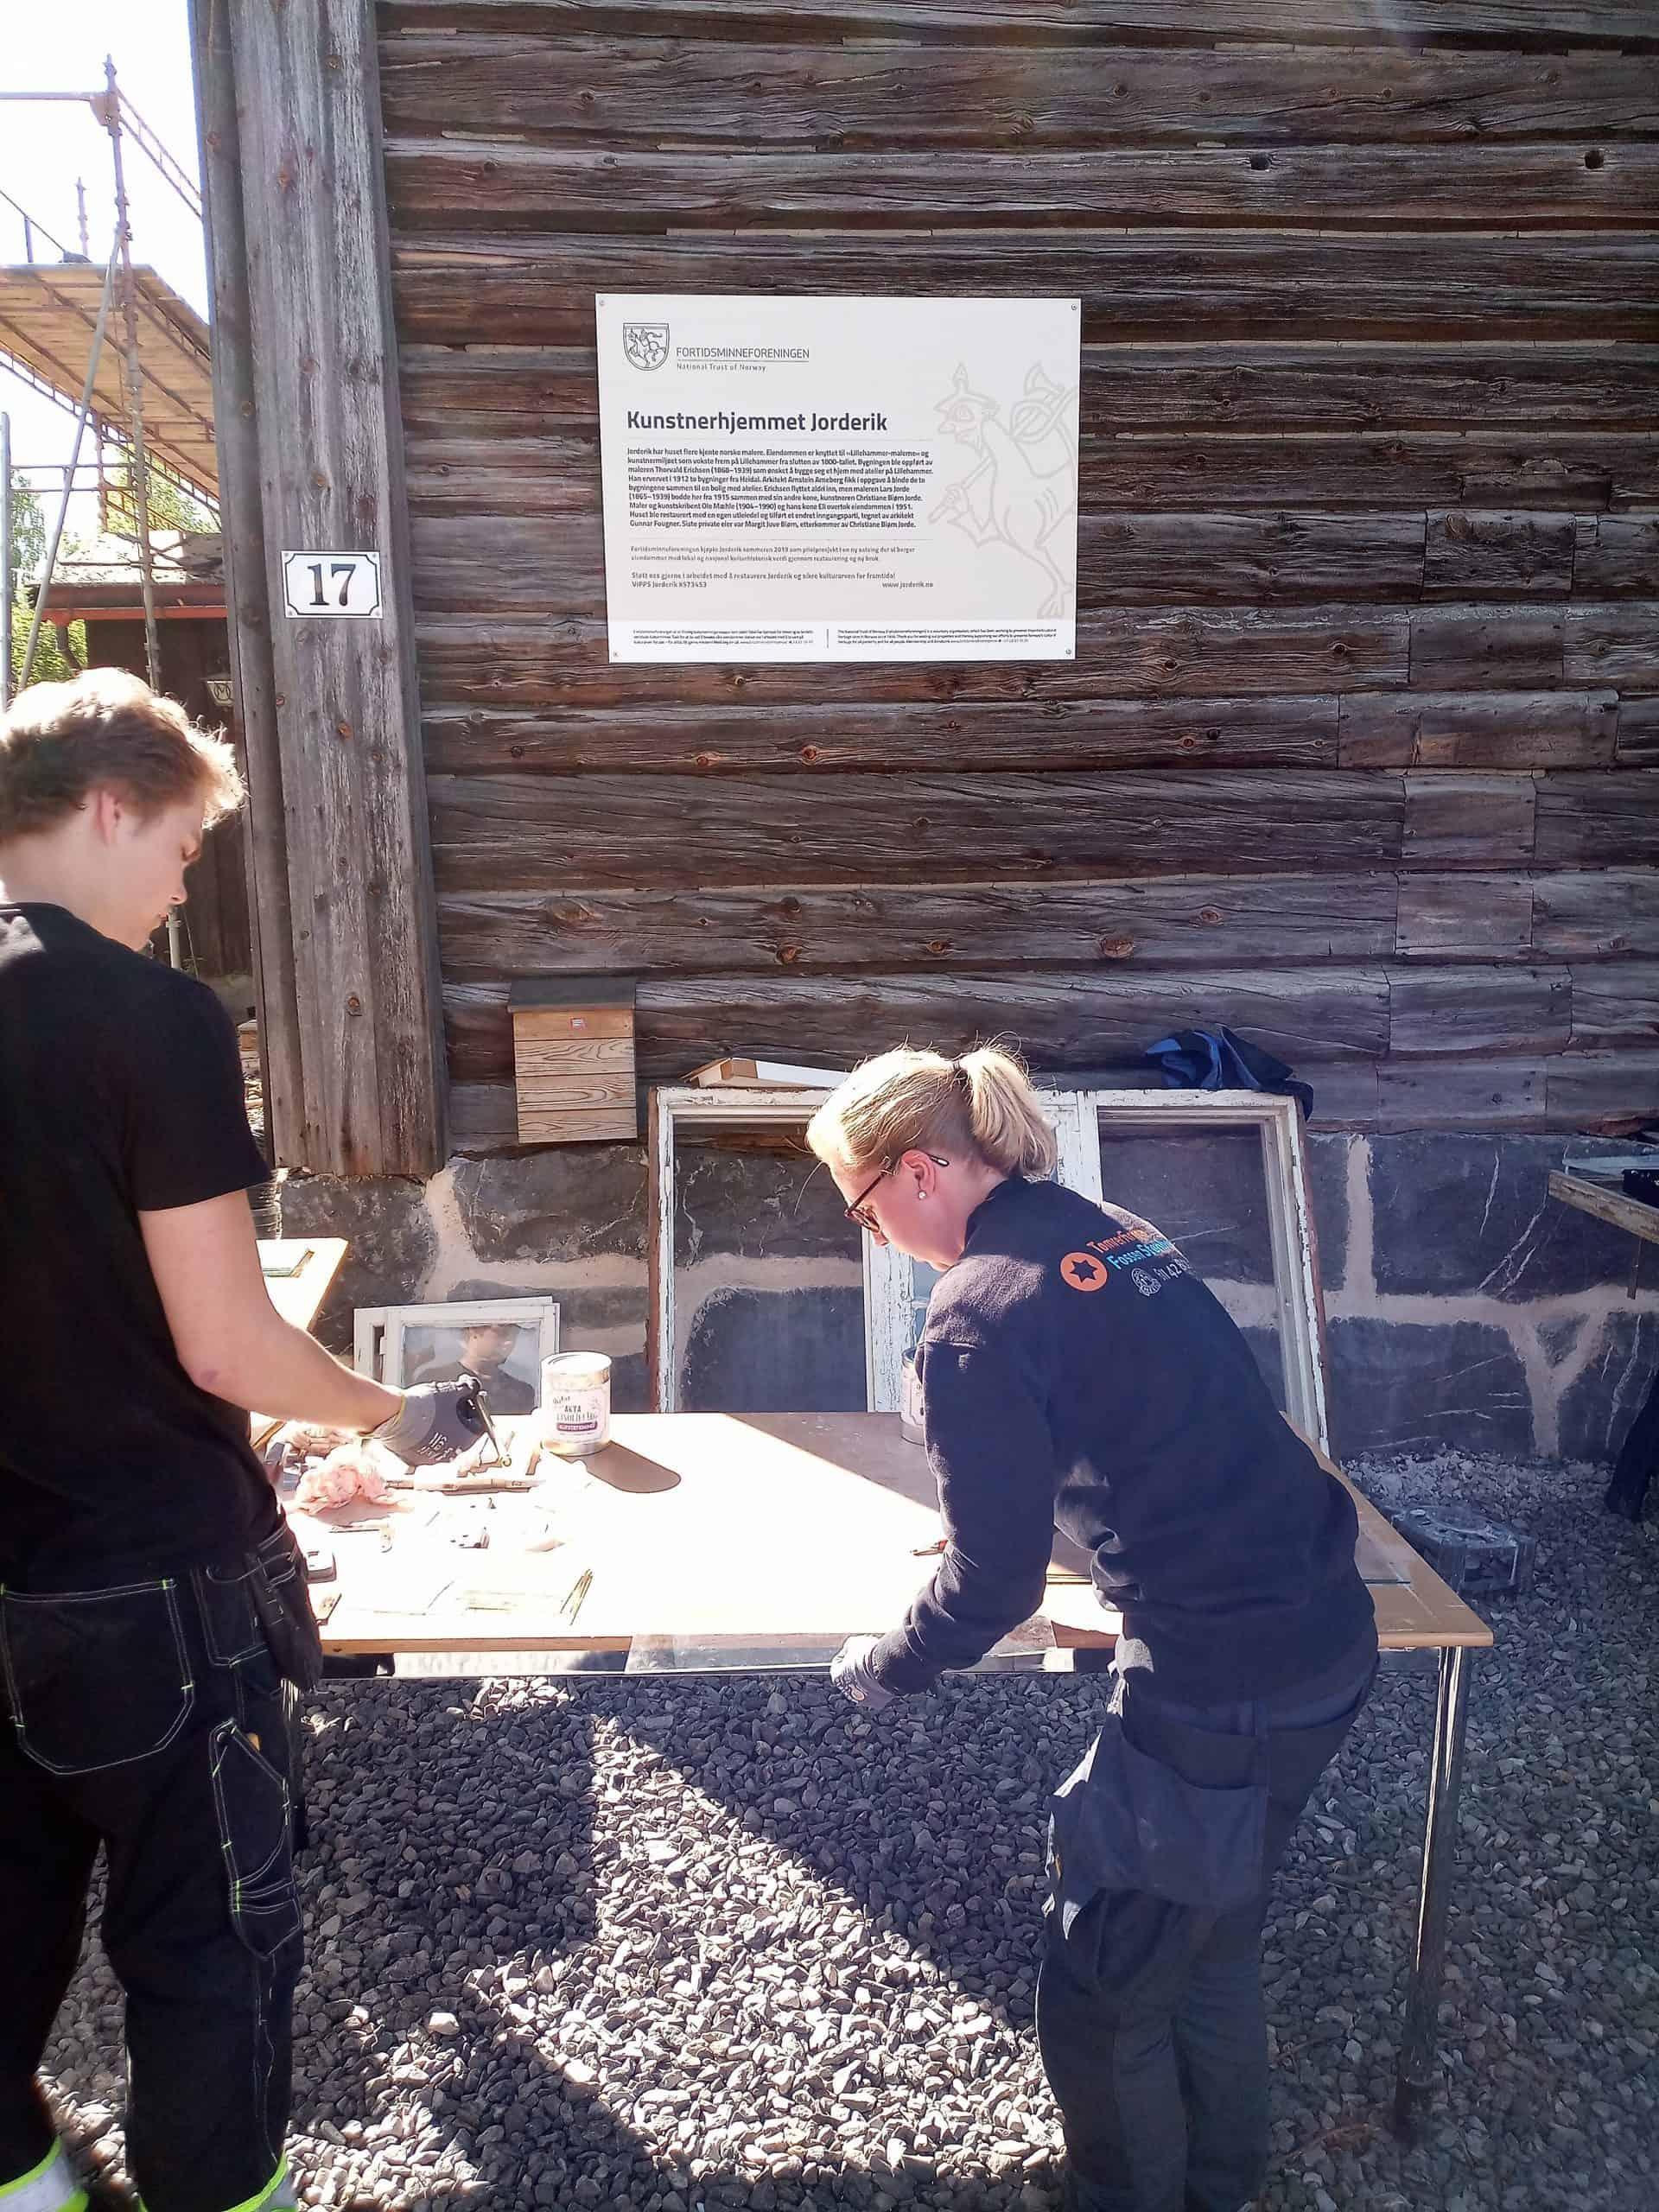 Kurs I Vindusrestaurering På Jorderik Lillehammer Sekel As